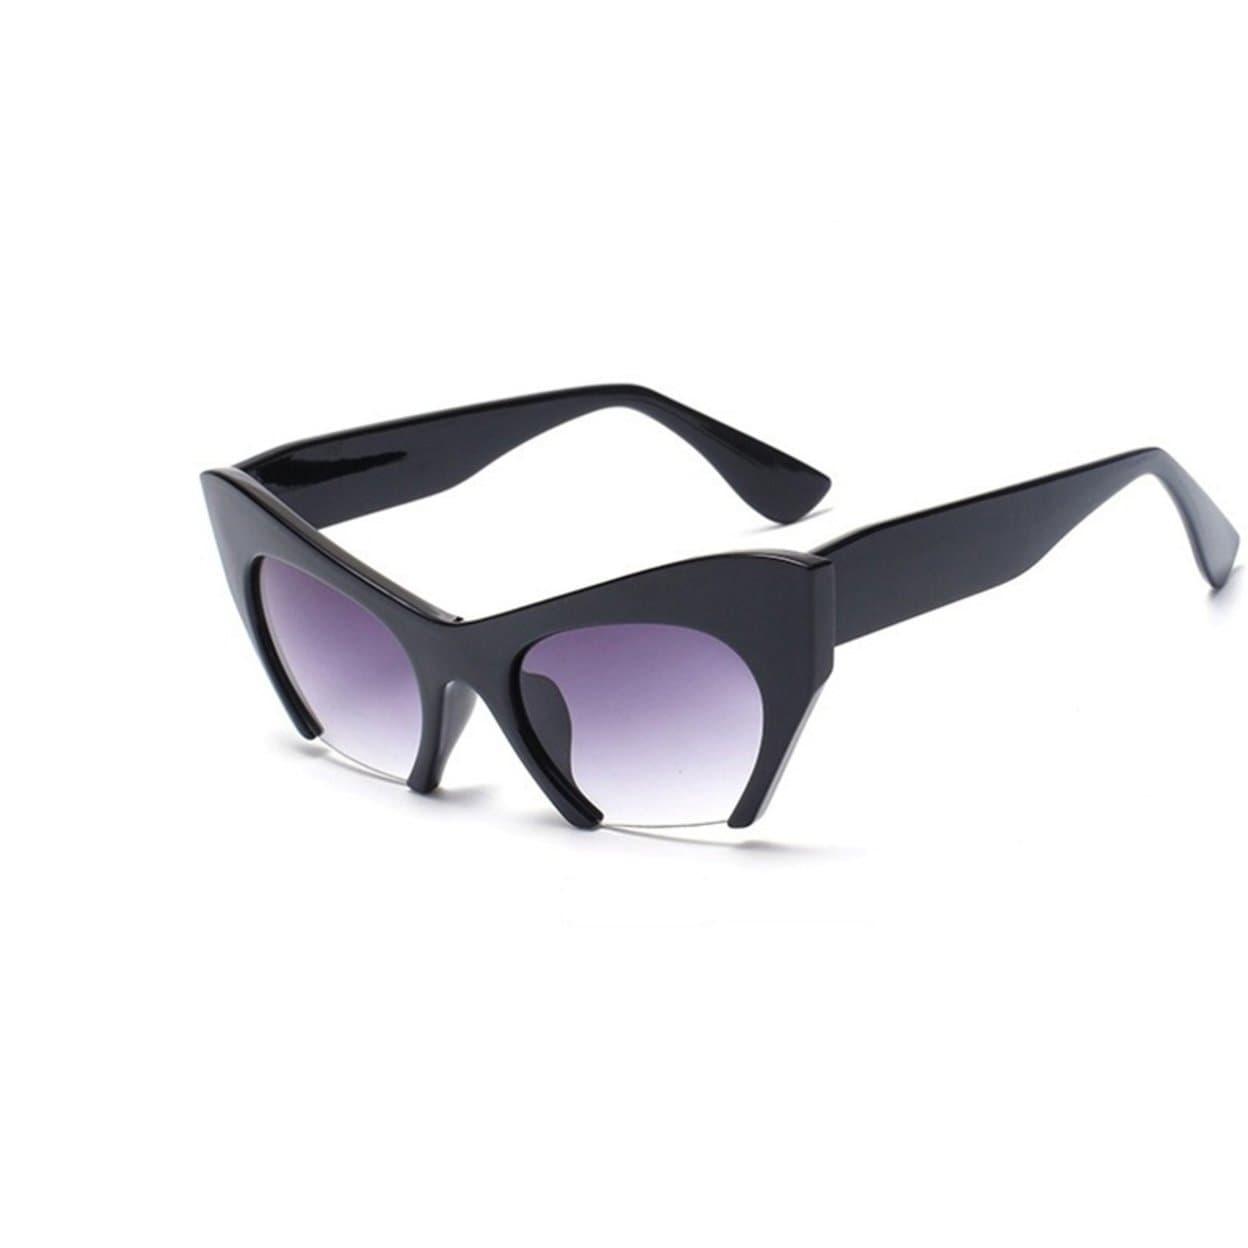 27238d9c6ca50 Shop Trendy Half Frame UV400 Eyewear Cat Eye Sunglasses Women Clear Brand  Designer Sun Glasses - On Sale - Free Shipping On Orders Over  45 -  Overstock - ...